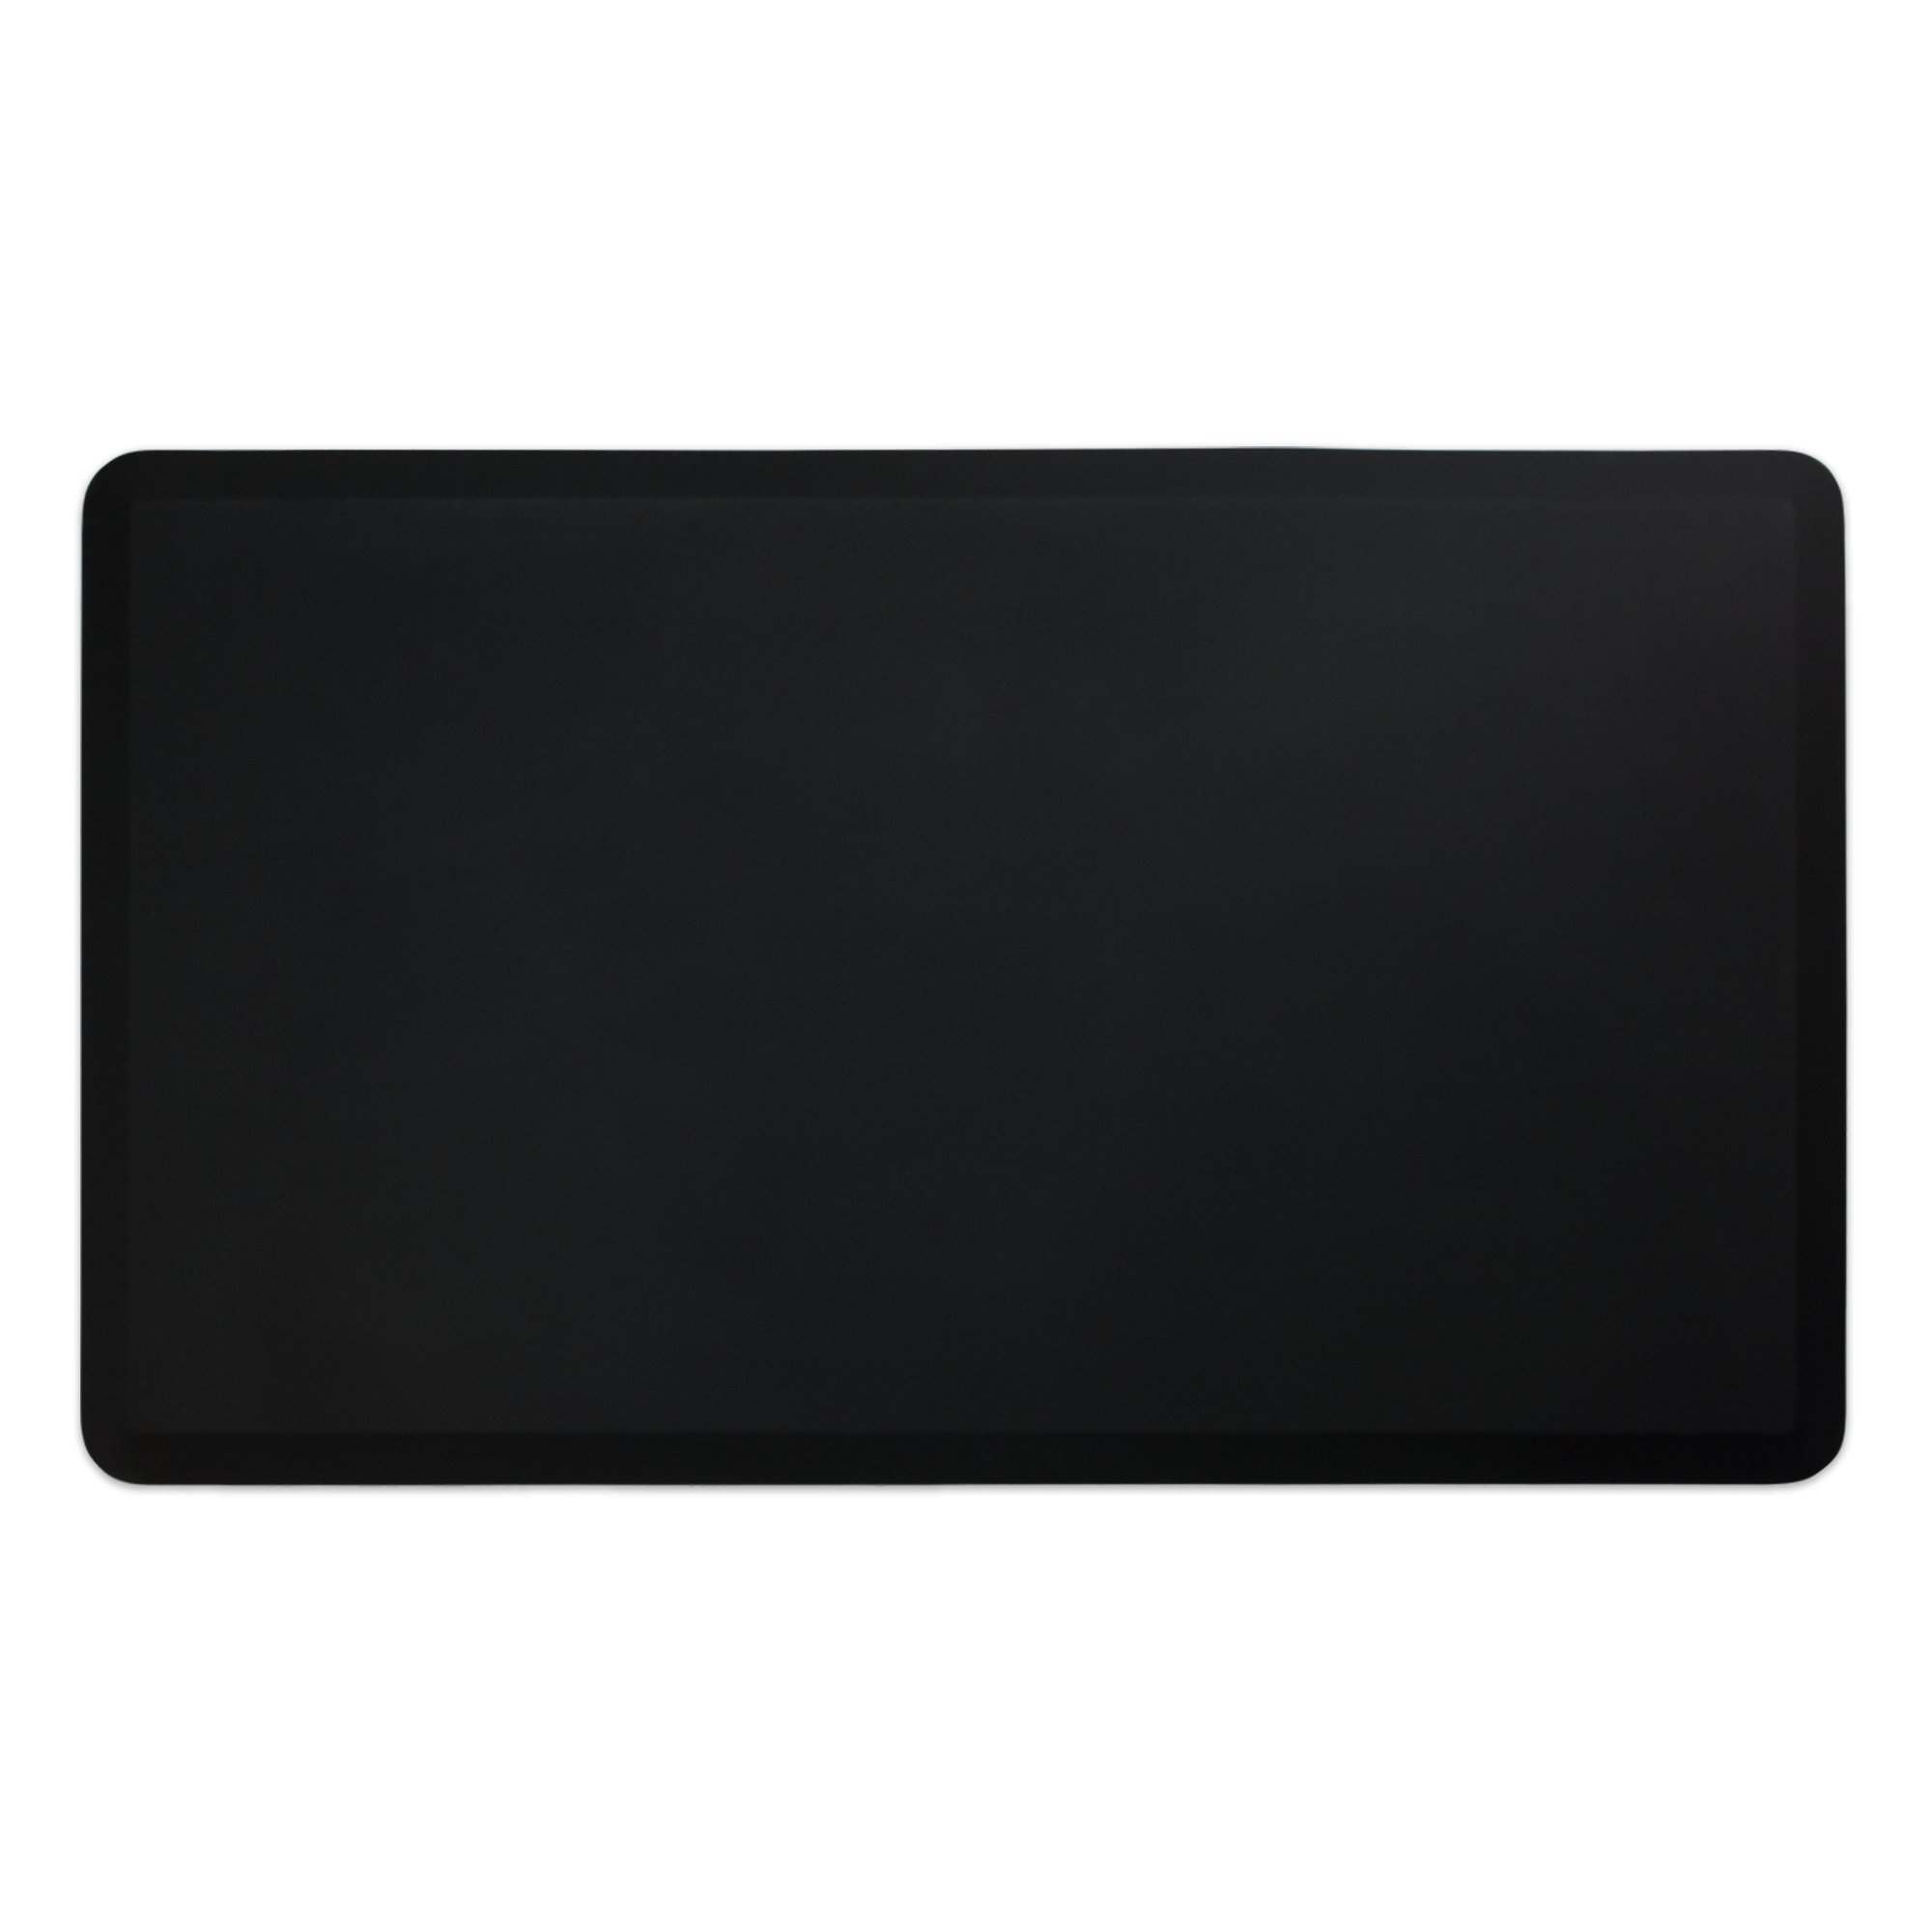 "NewLife by GelPro Professional Grade Anti-Fatigue Kitchen & Office Comfort Mat, 36x60, Midnight ¾"" Bio-Foam Mat with non-slip bottom for health & wellness"